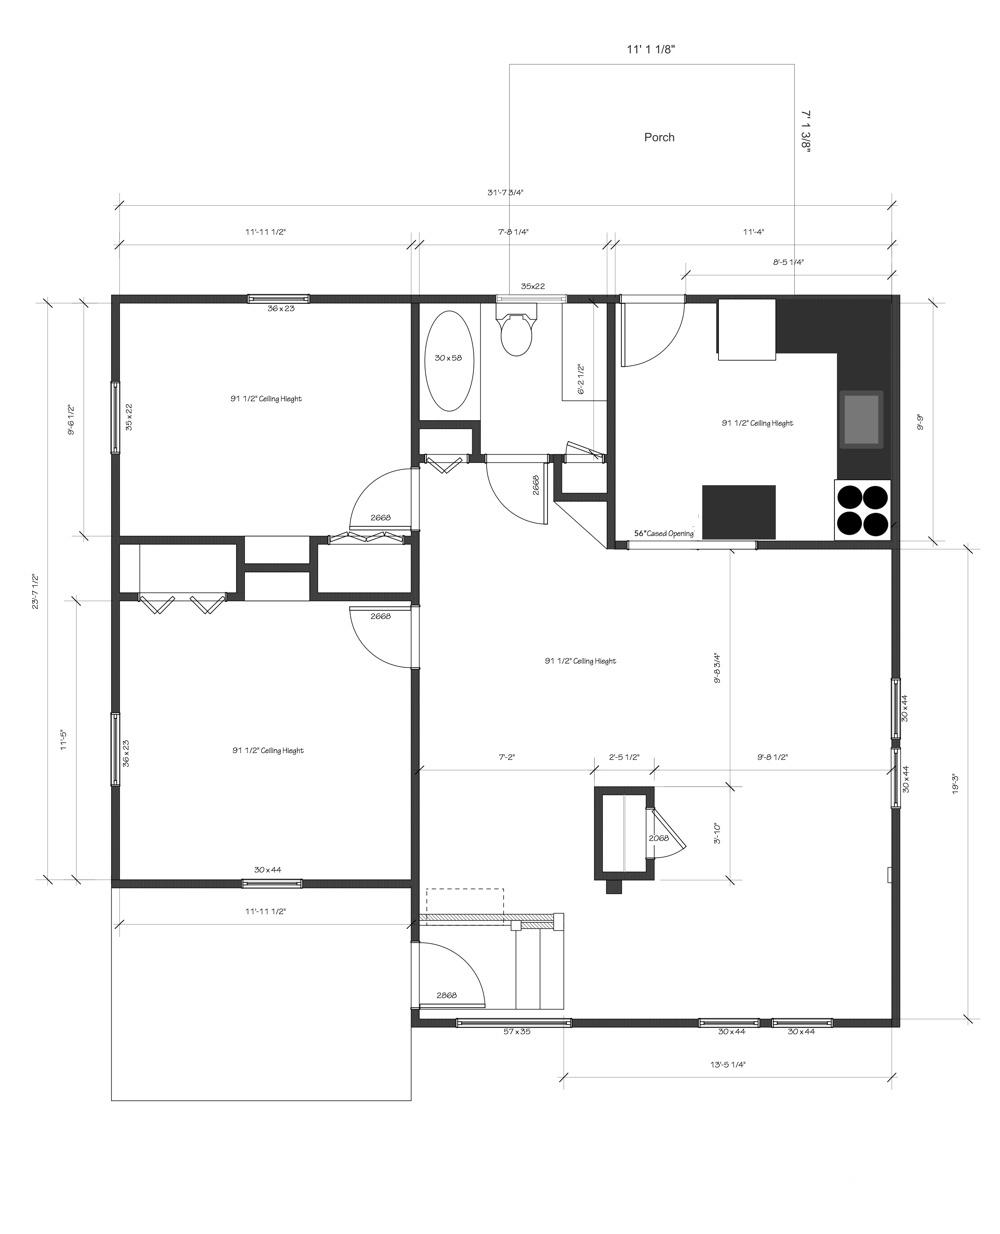 493 Riverside plans ORIGINAL kitchen